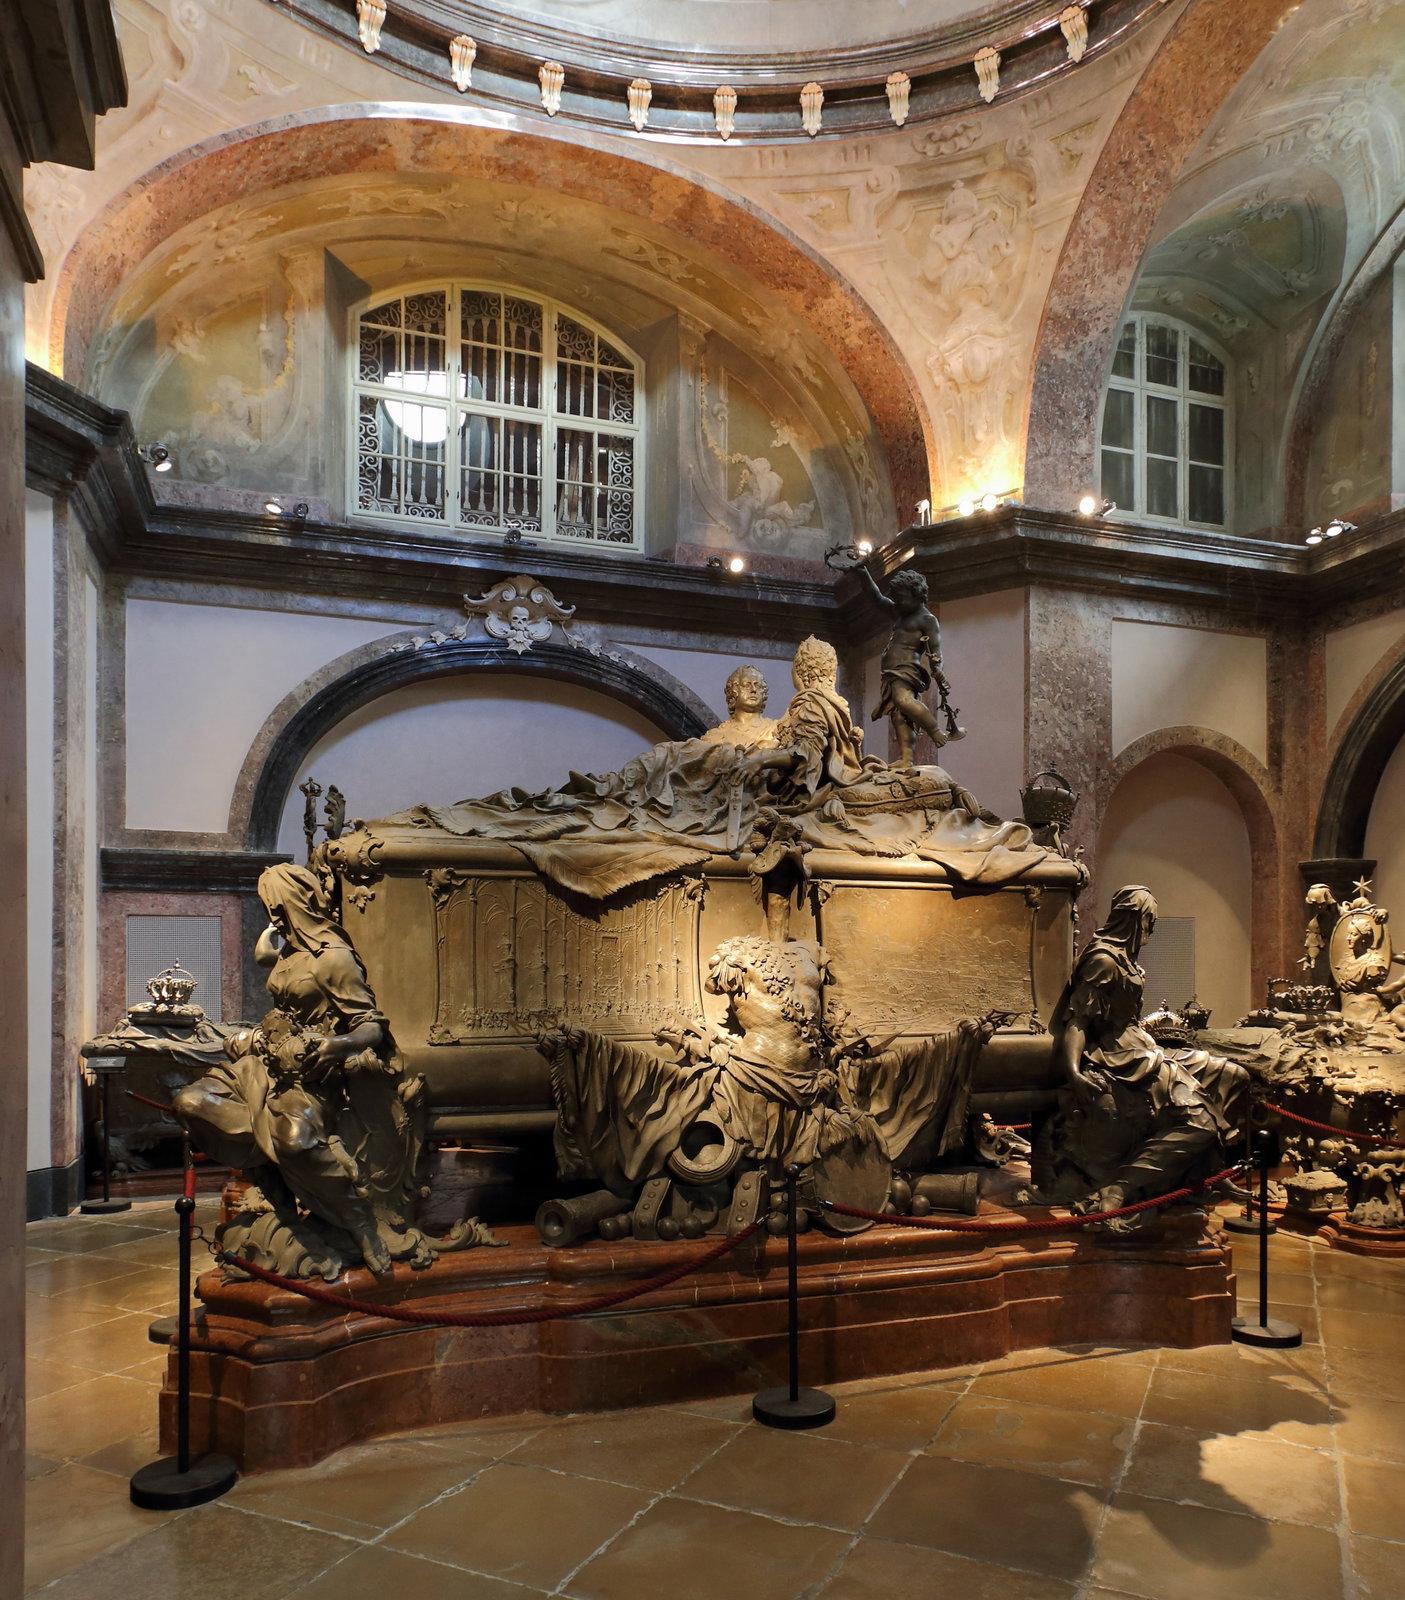 саркофаг Марии Терезии и Франца Стефана в Императорской гробнице